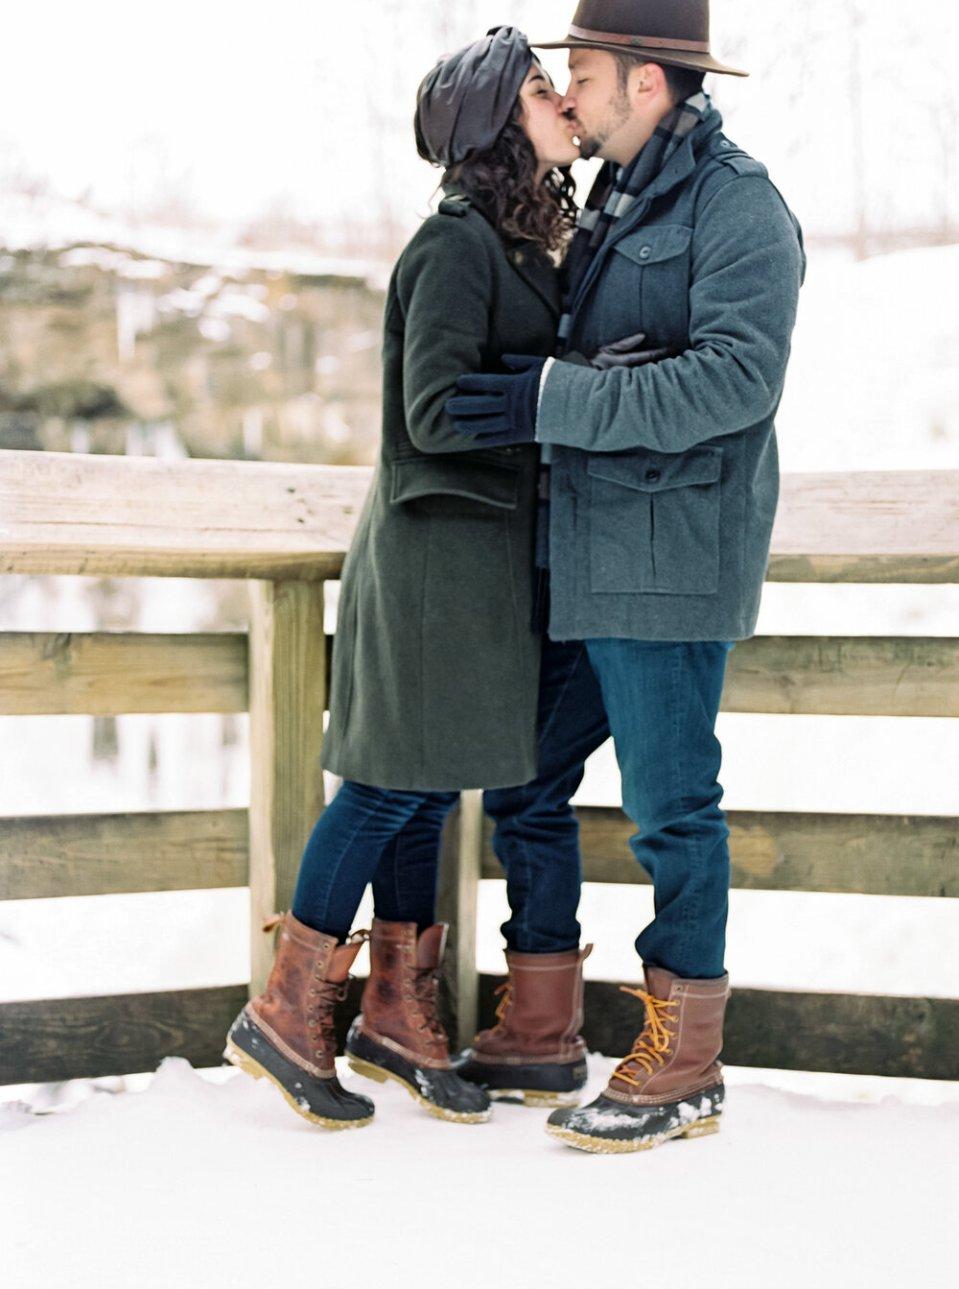 0987654567 Frozen+Brandywine+Falls+Photos+by+Cleveland+Wedding+Photographer+Matt+Erickson+Photography.jpg